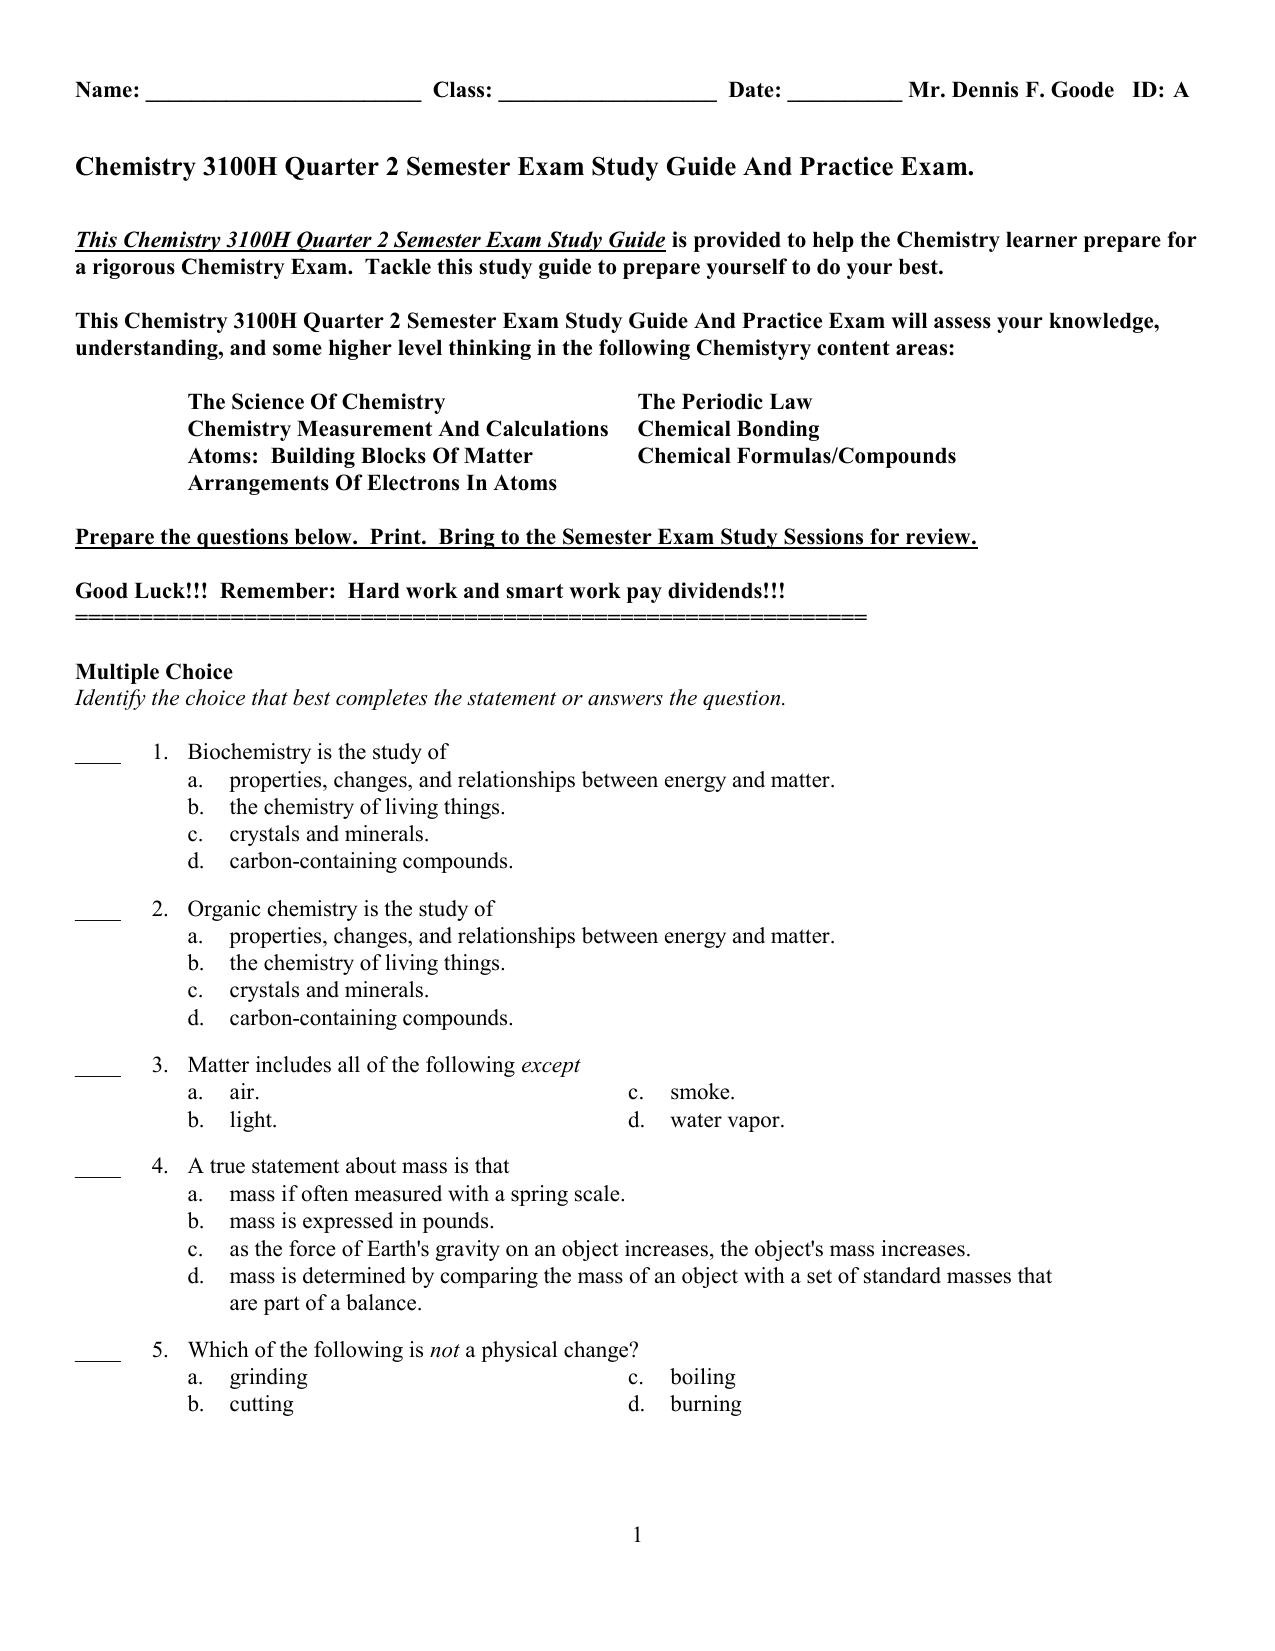 Chemistry 3100H Quarter 2 Semester Practice Exam